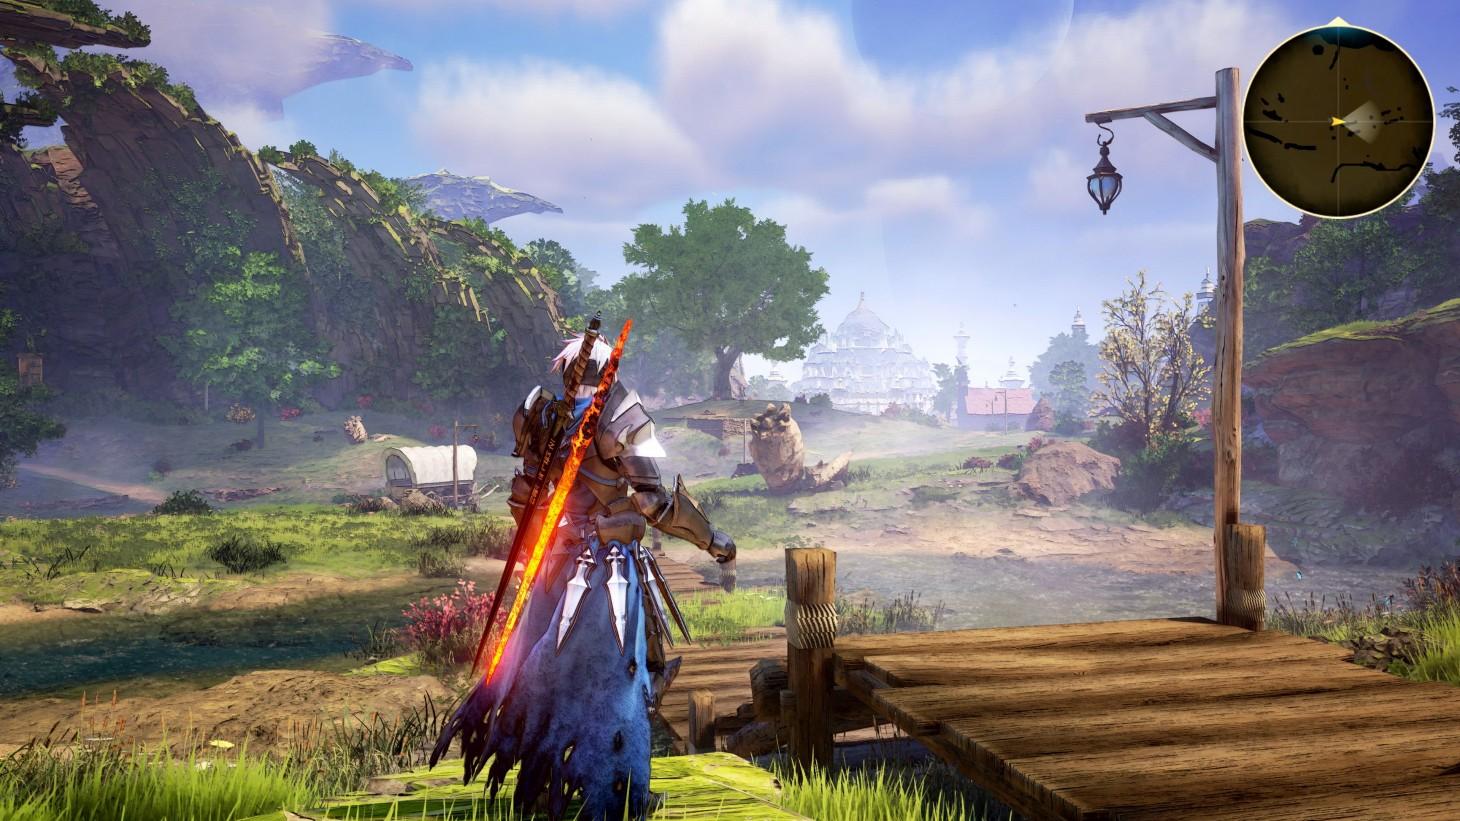 Hands-On With Tales Of Arise Reveals Smart, Strategic Gameplay Tweaks - Game Informer